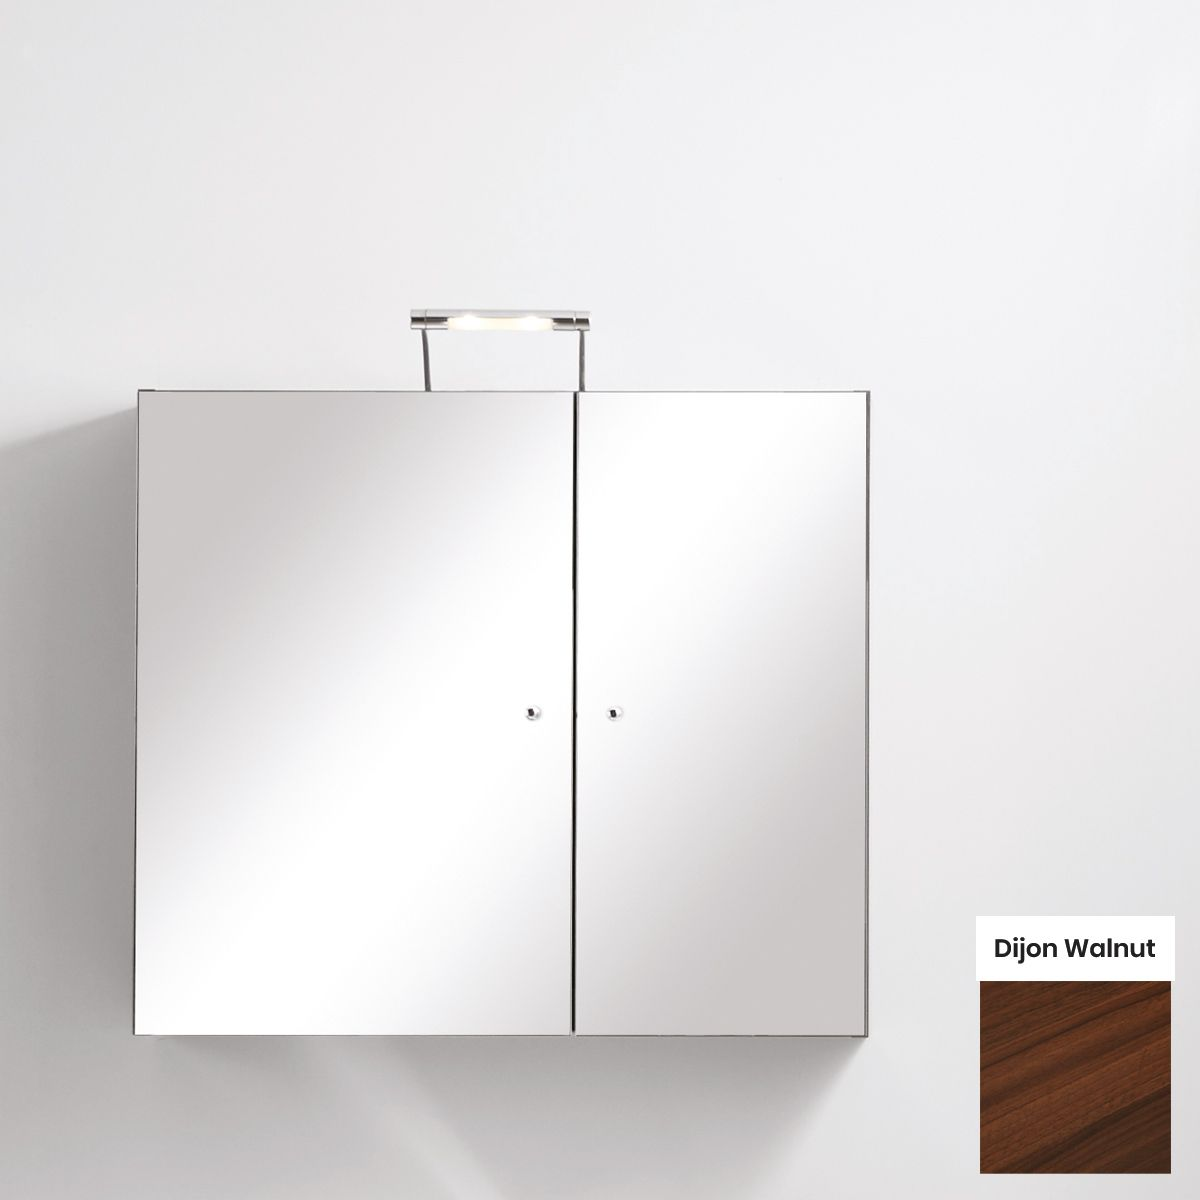 Elation Eko Dijon Walnut Mirror Wall Unit 750mm